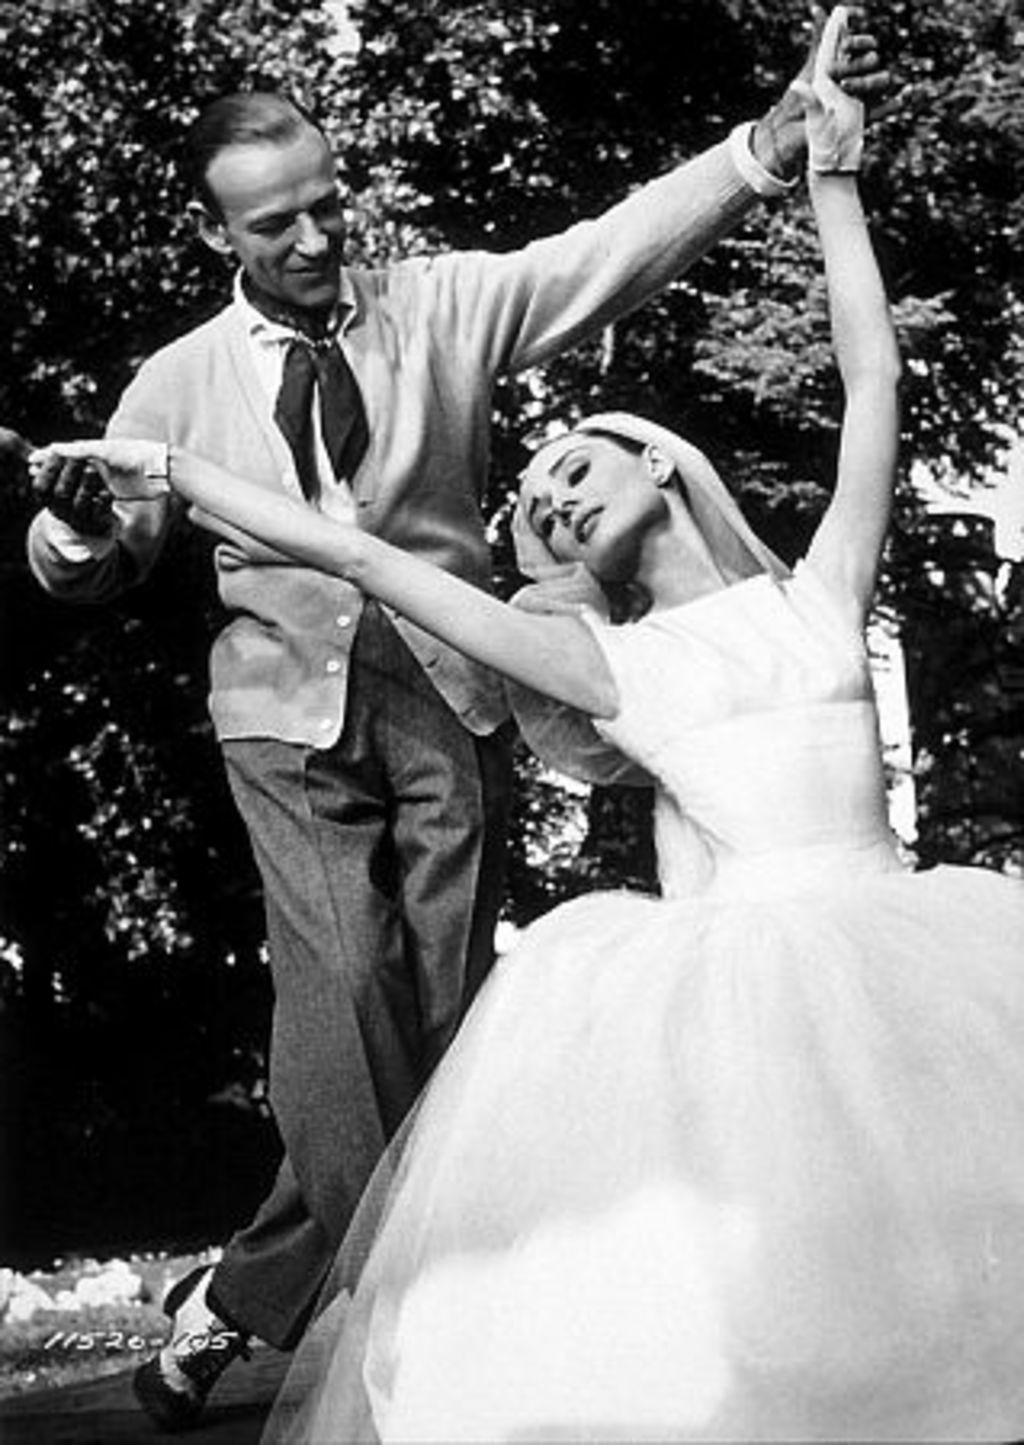 funny face wedding dress » Wedding Dresses Designs, Ideas and Photos ...